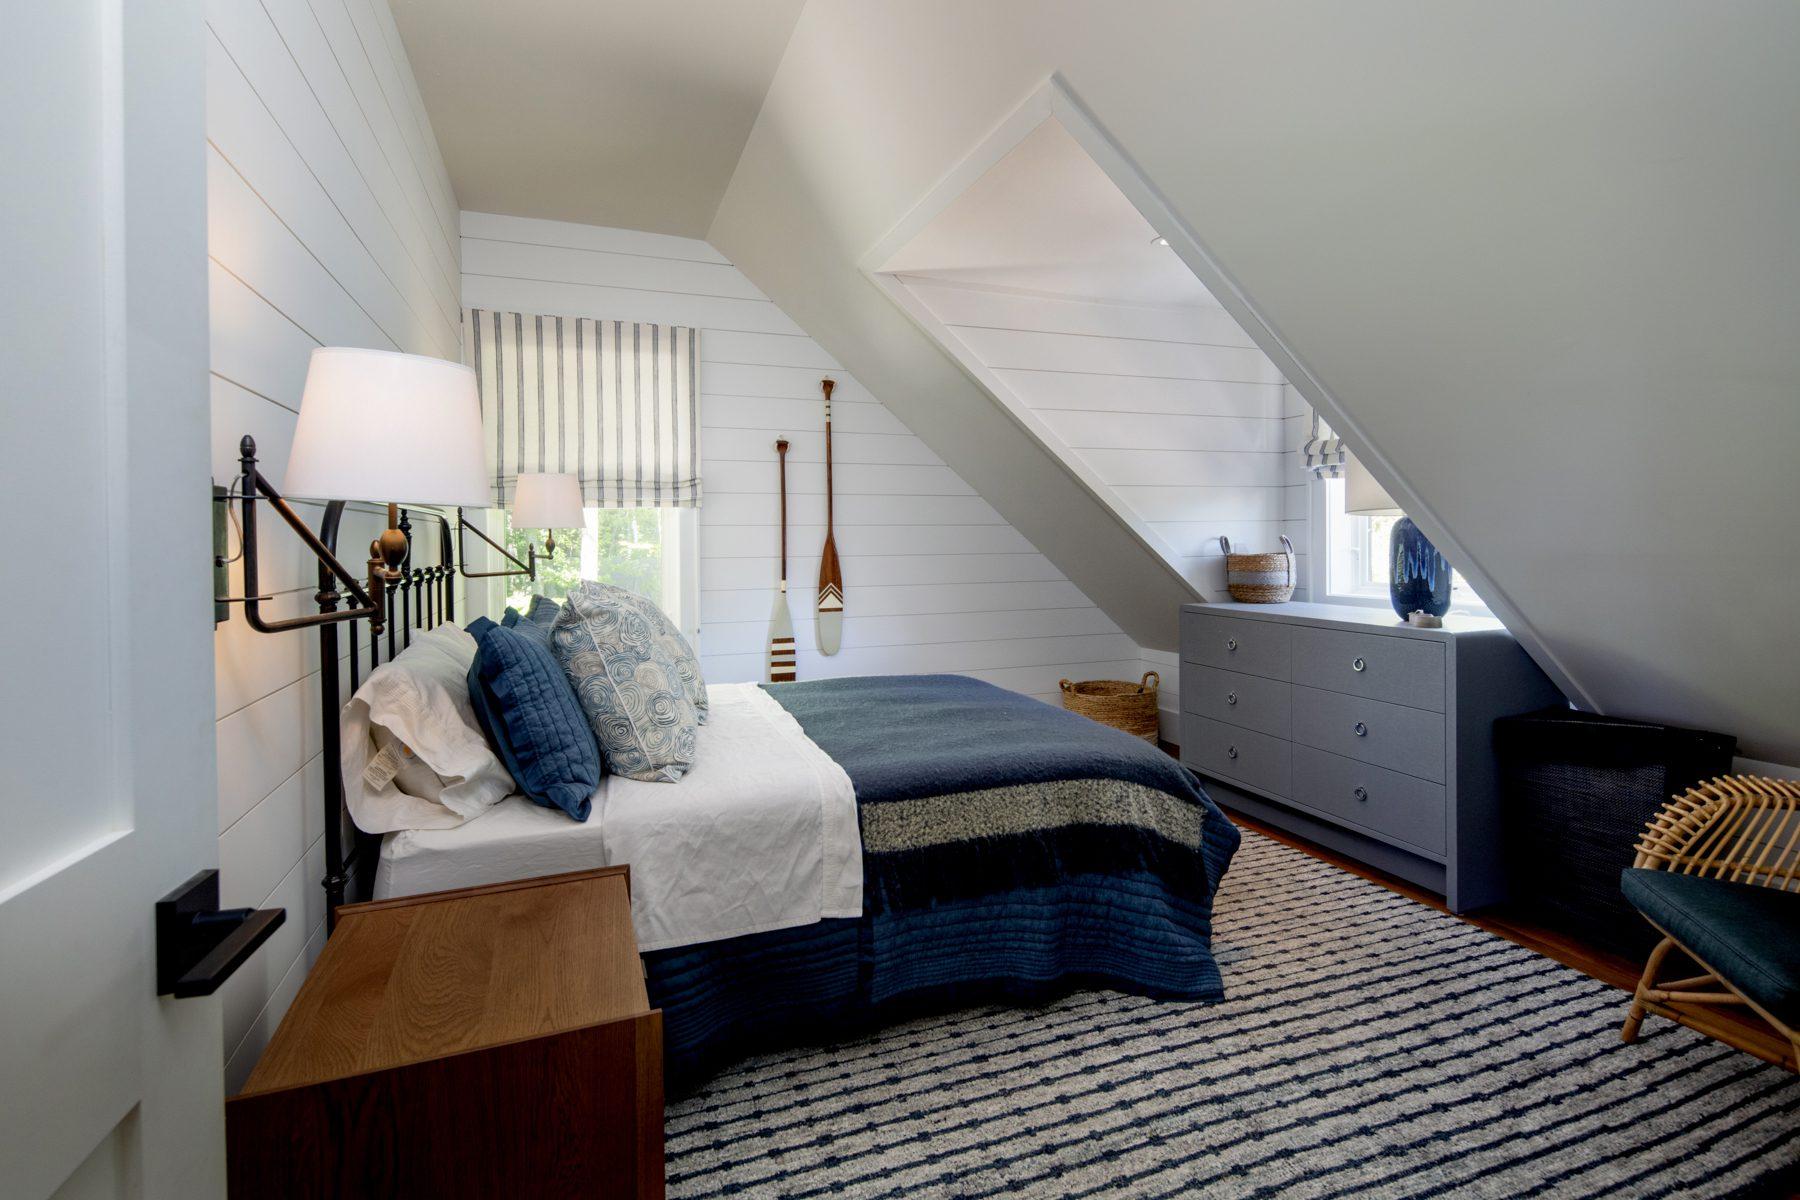 Normerica-Timber-Homes-Timber-Frame-Portfolio-Beachside-Bliss-Interior-Suite-Above-Garage-Bedroom